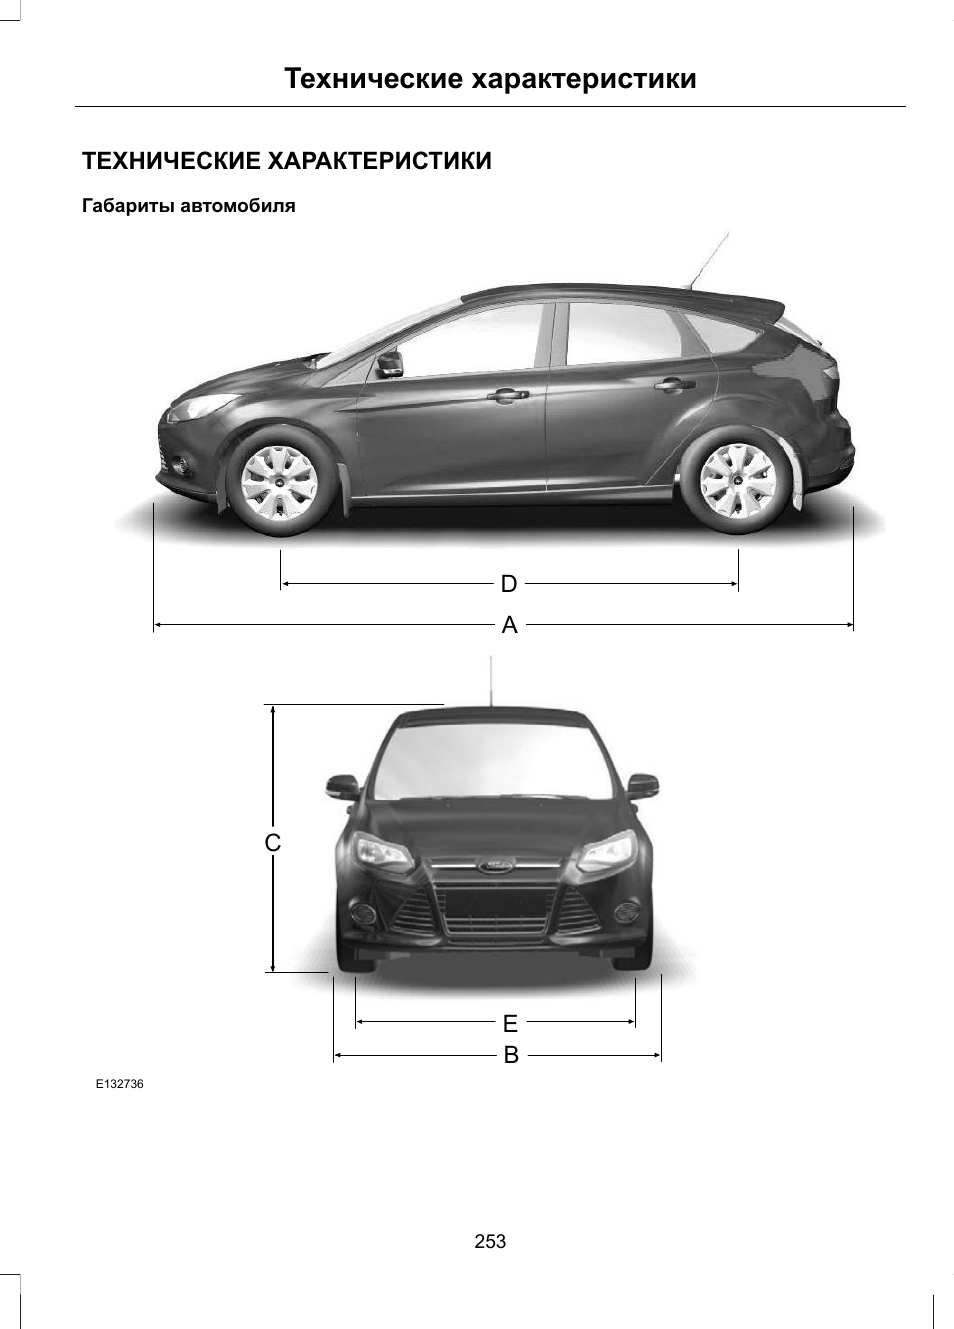 Ford Focus 2011, 2012, 2013, 2014, 2015, седан, 3 ...